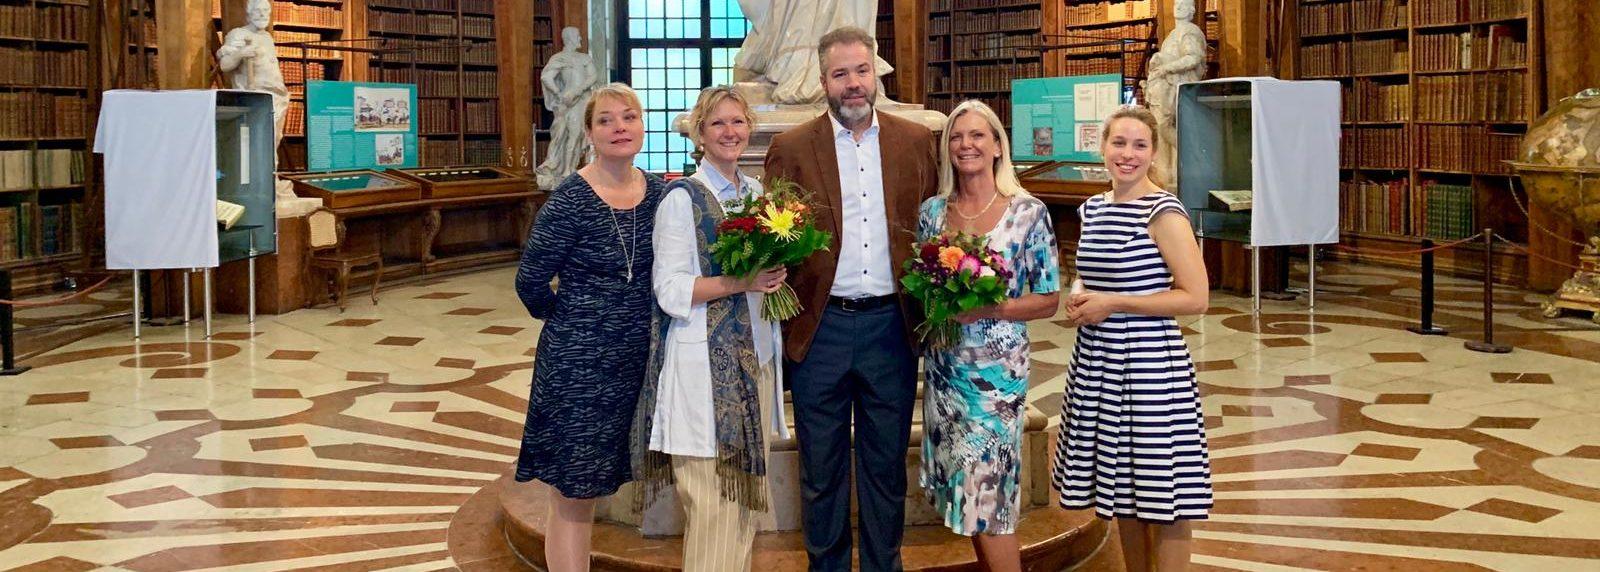 ÖGV Rückblicke Frau im ÖGV: Buchpatenschaft in der Nationalbibliothek am 13. September: eine Rückblende